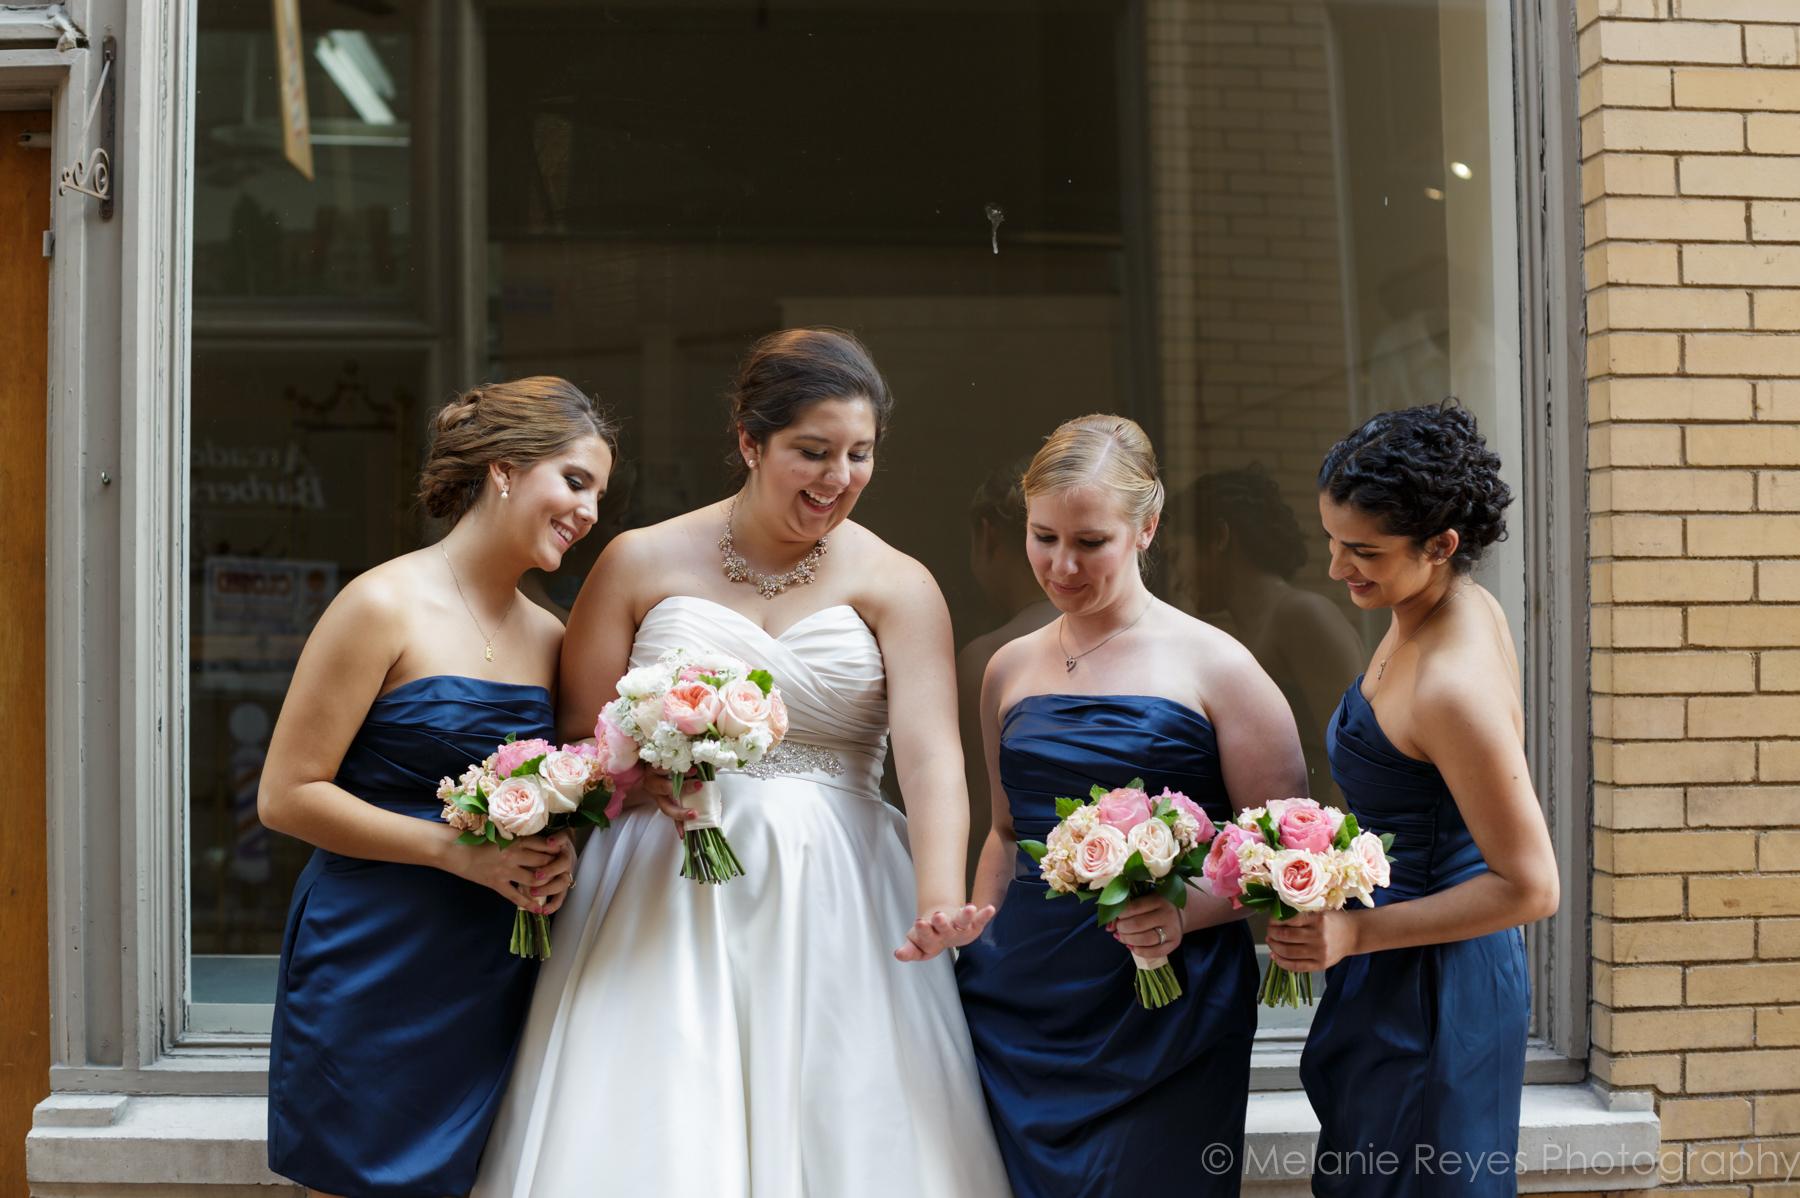 MC_annarbor_uofm_wedding_043